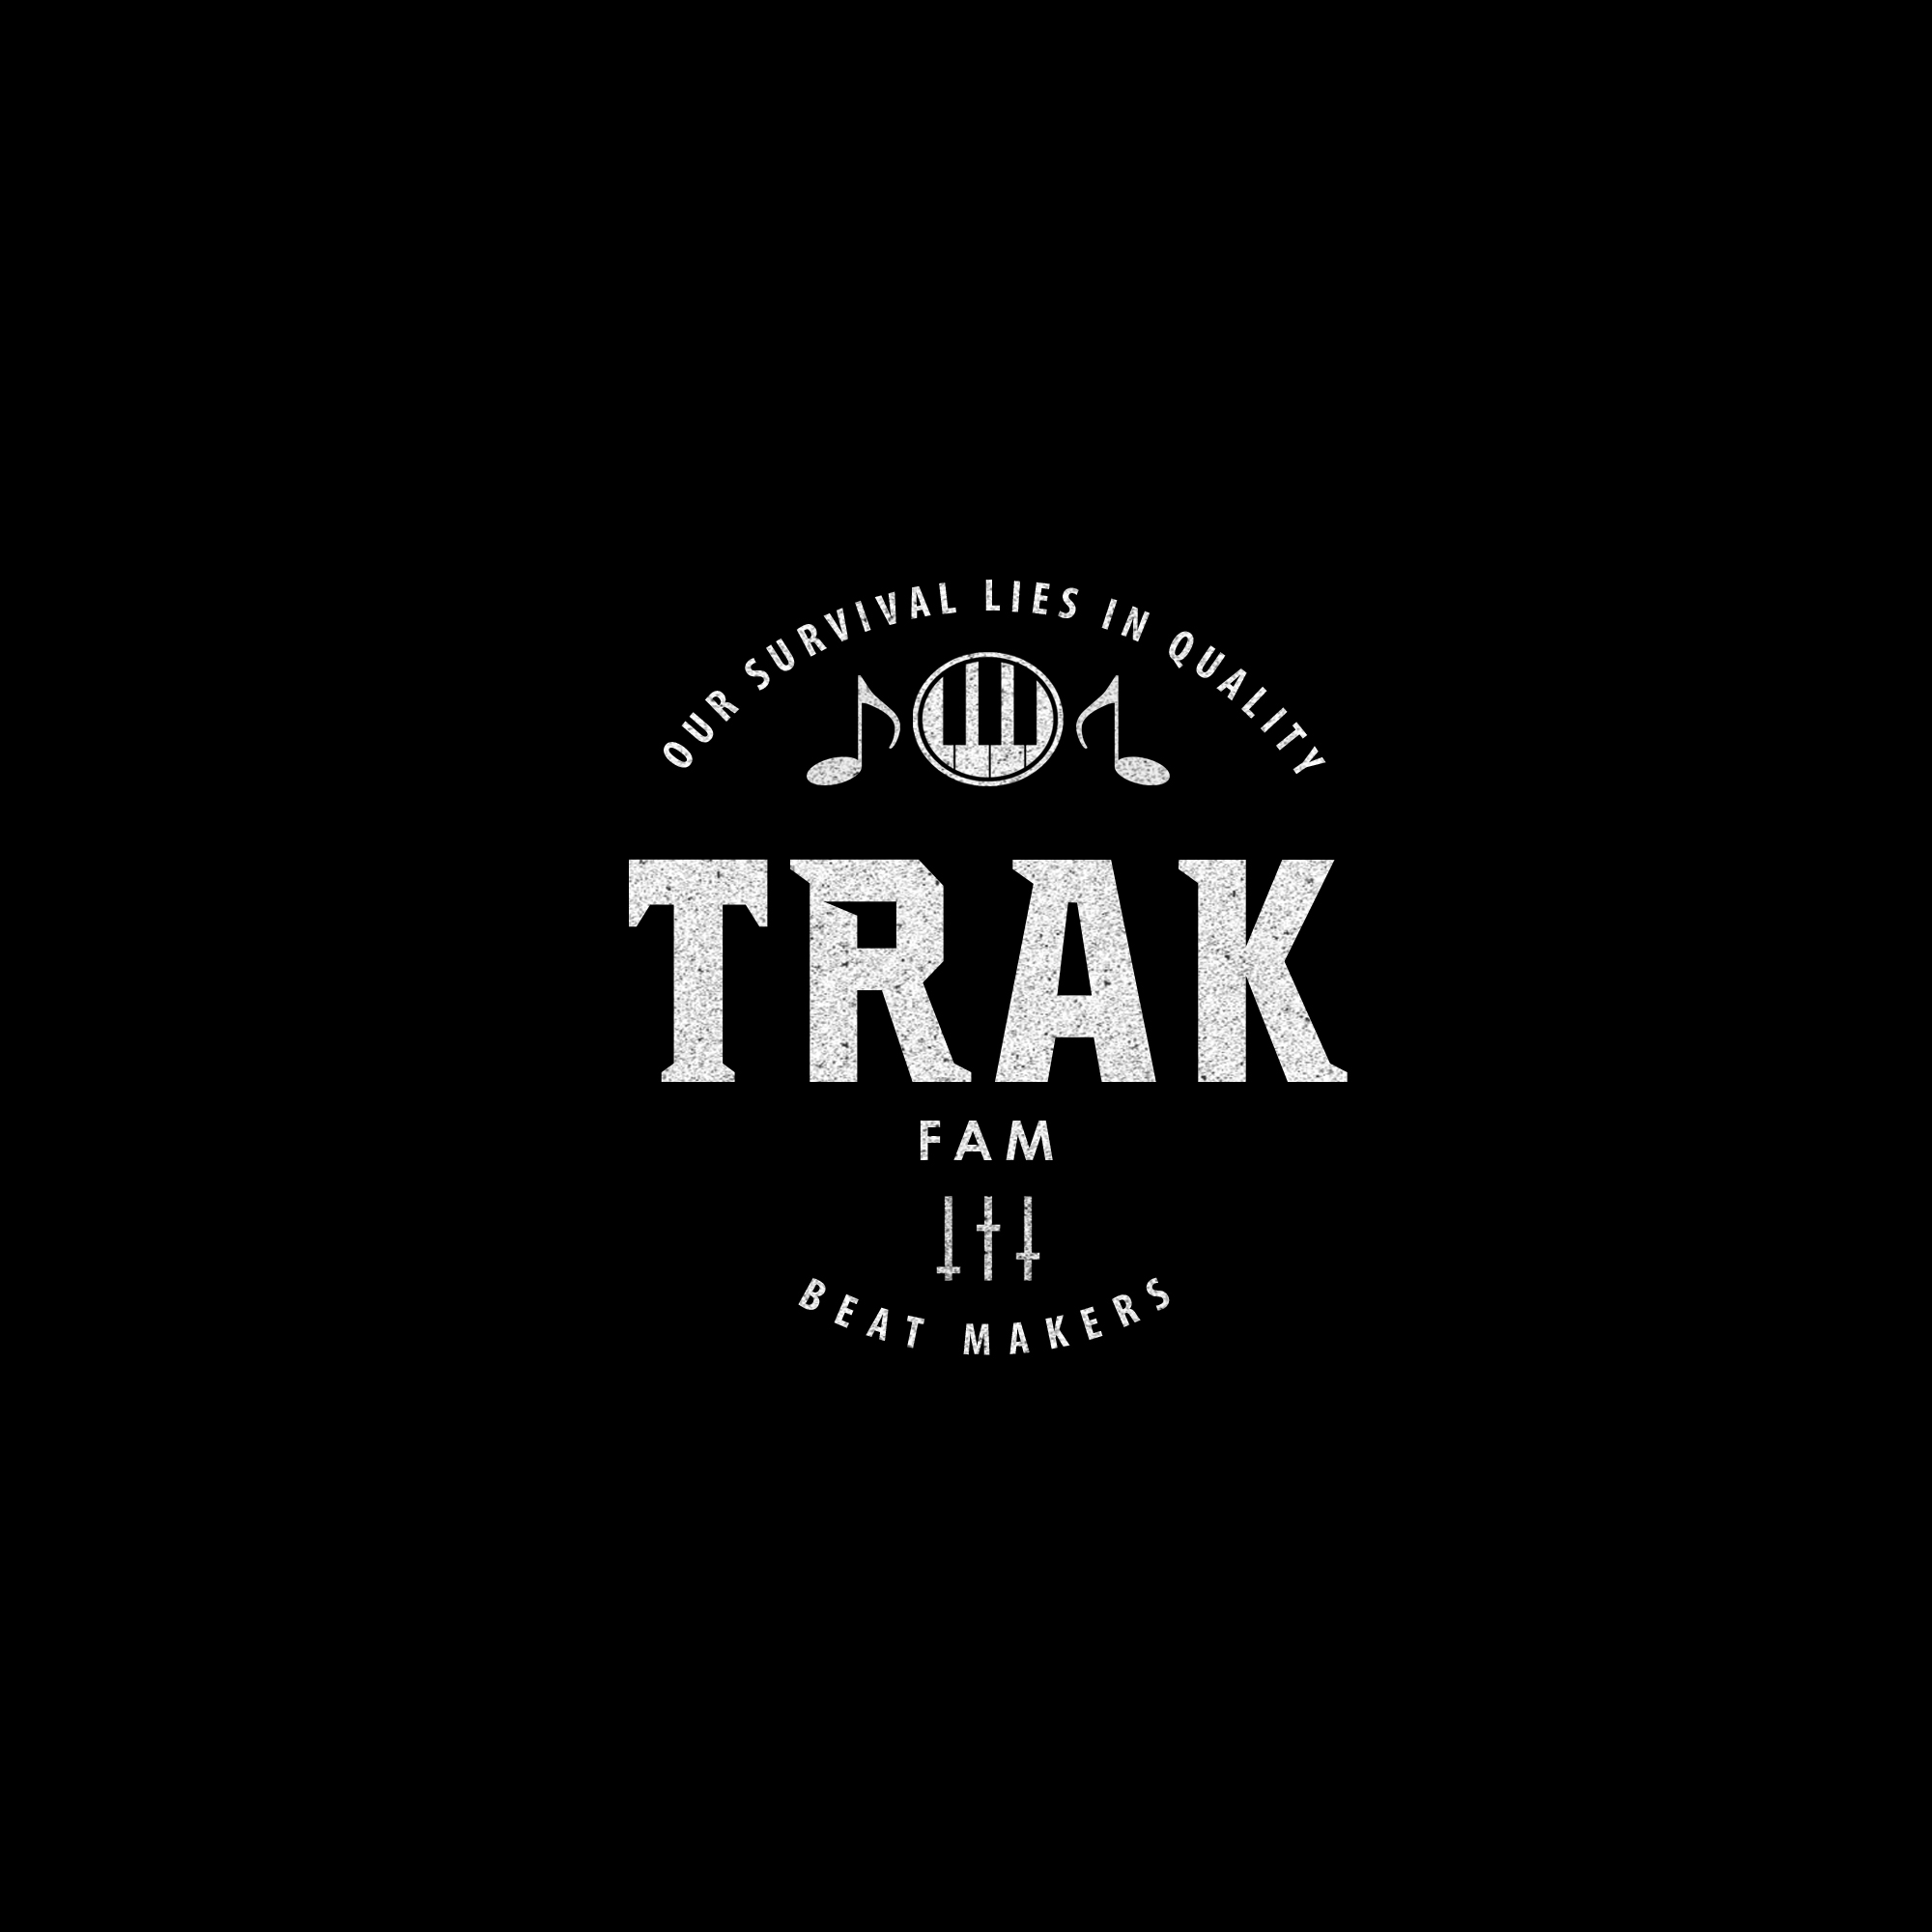 Introducing East Coast production team Trak Fam!